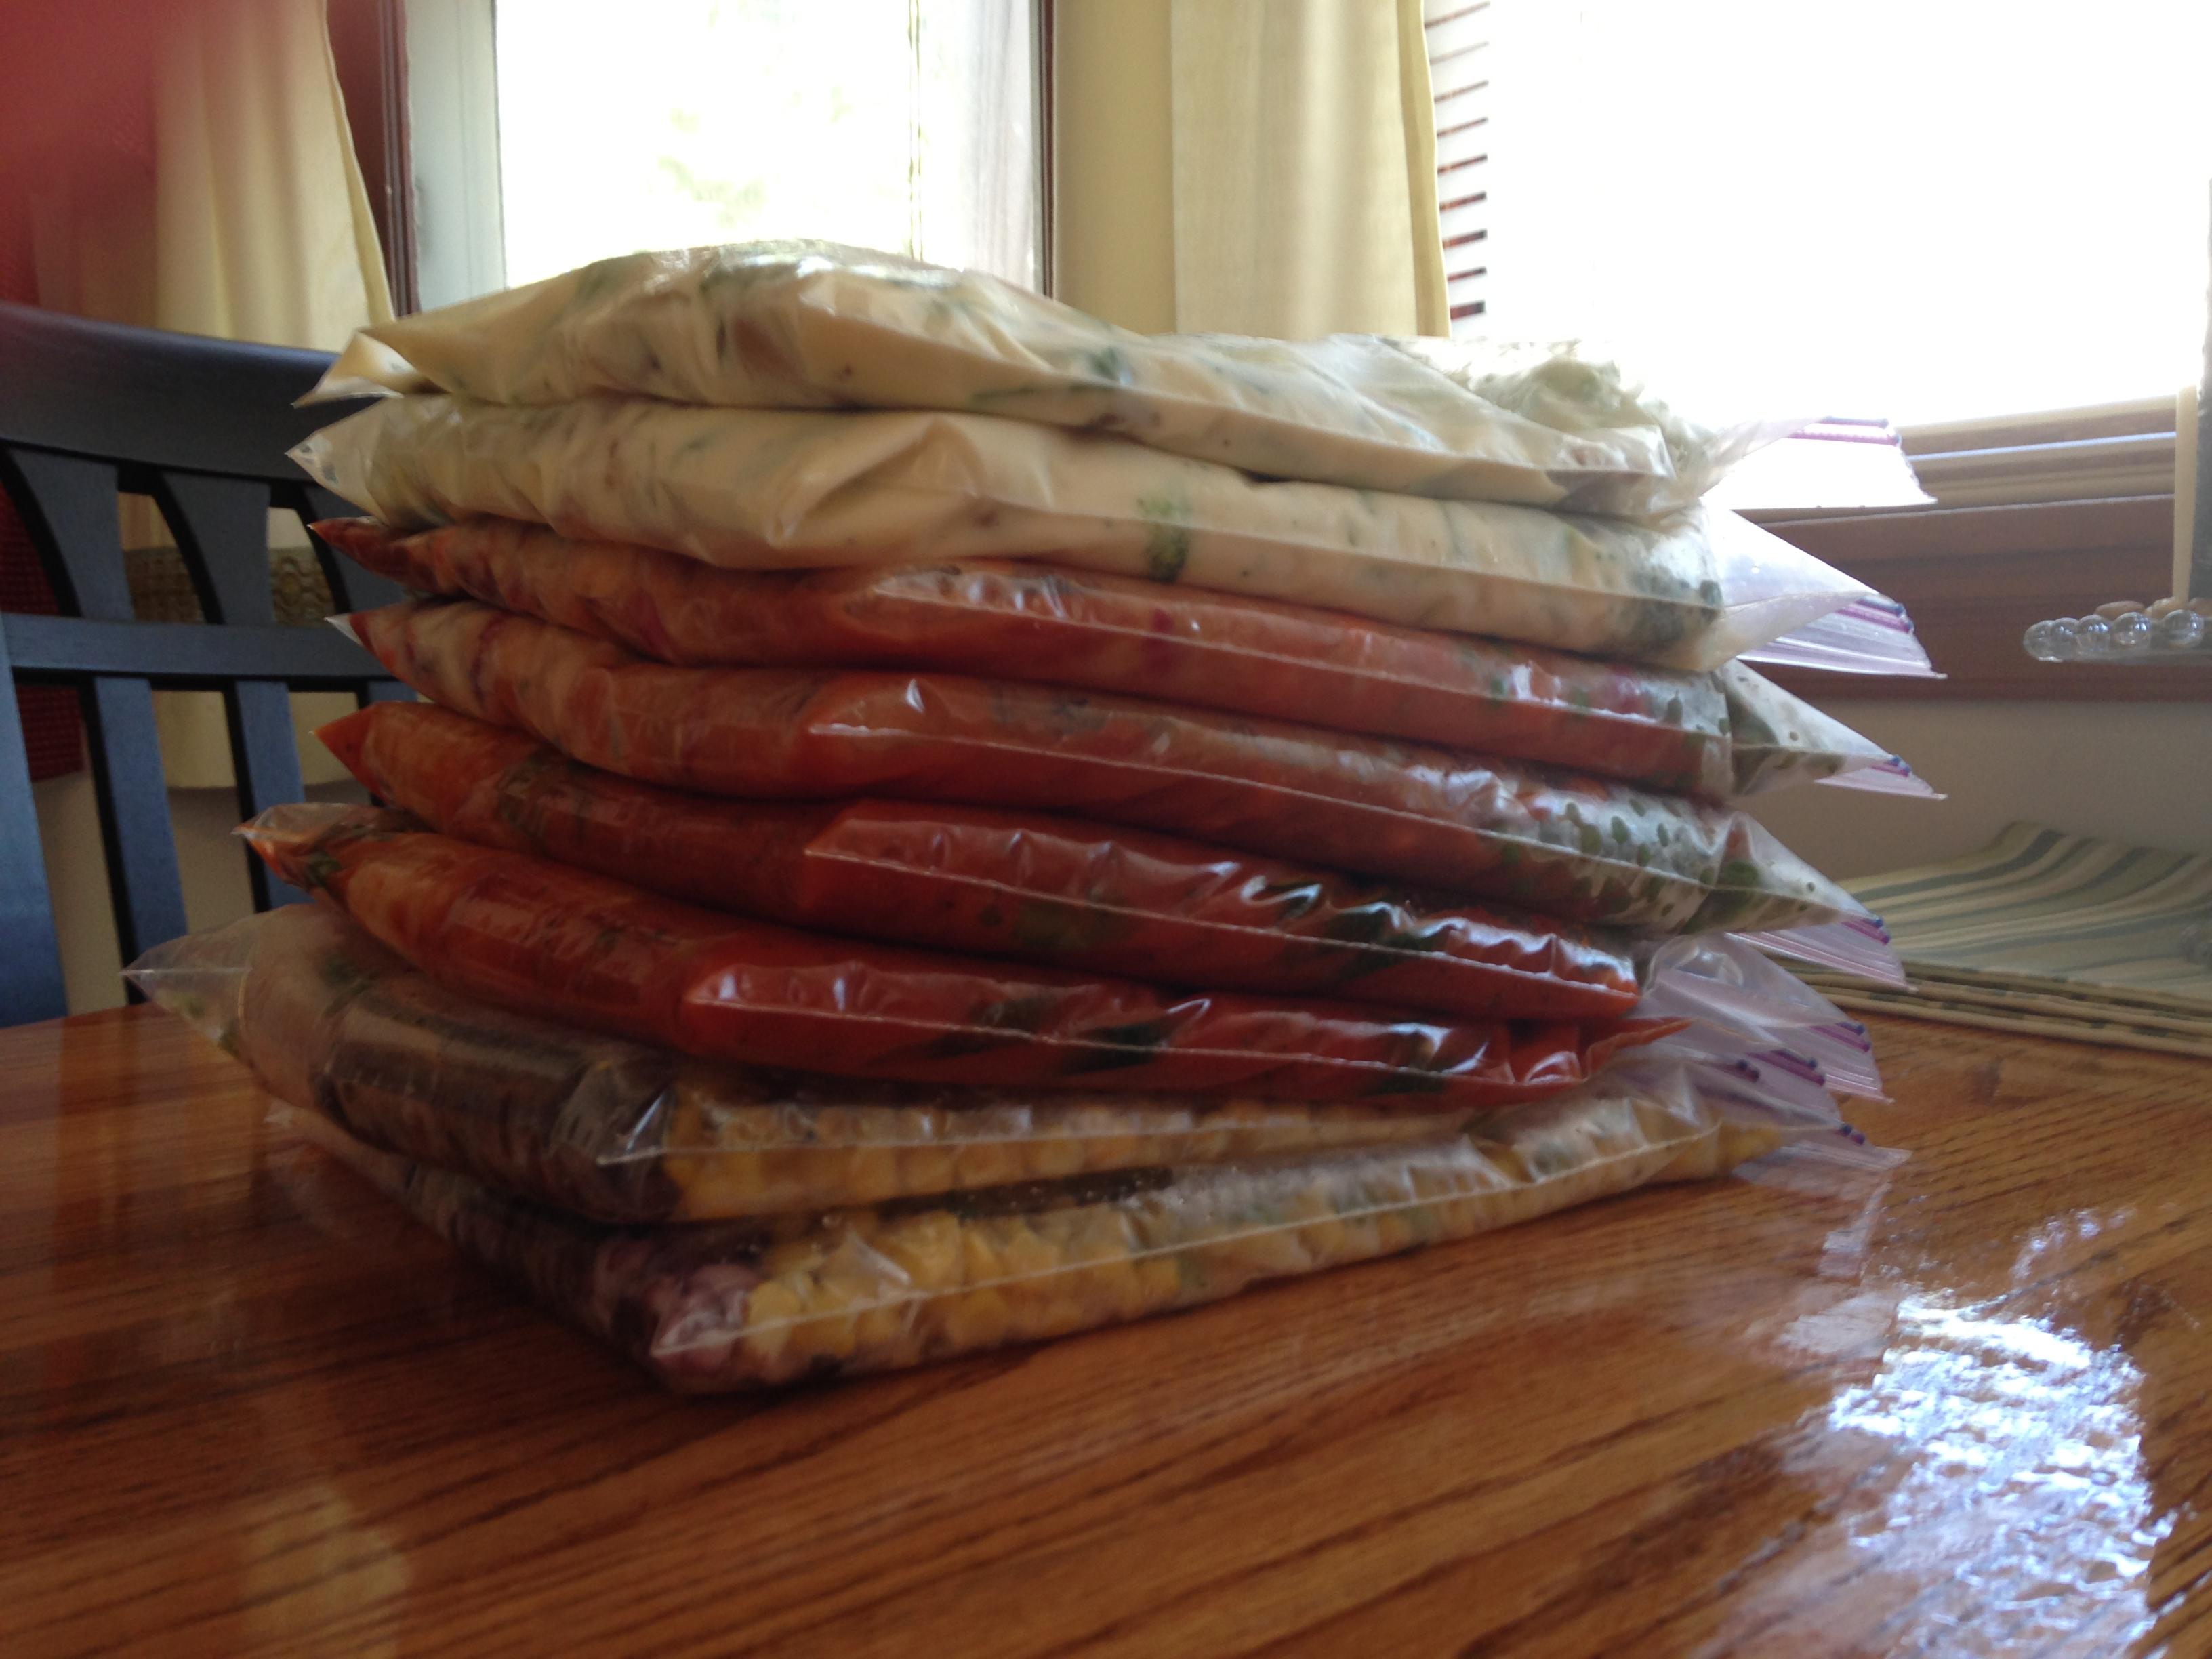 Crockpot Meals (c) Kristen Dembroski